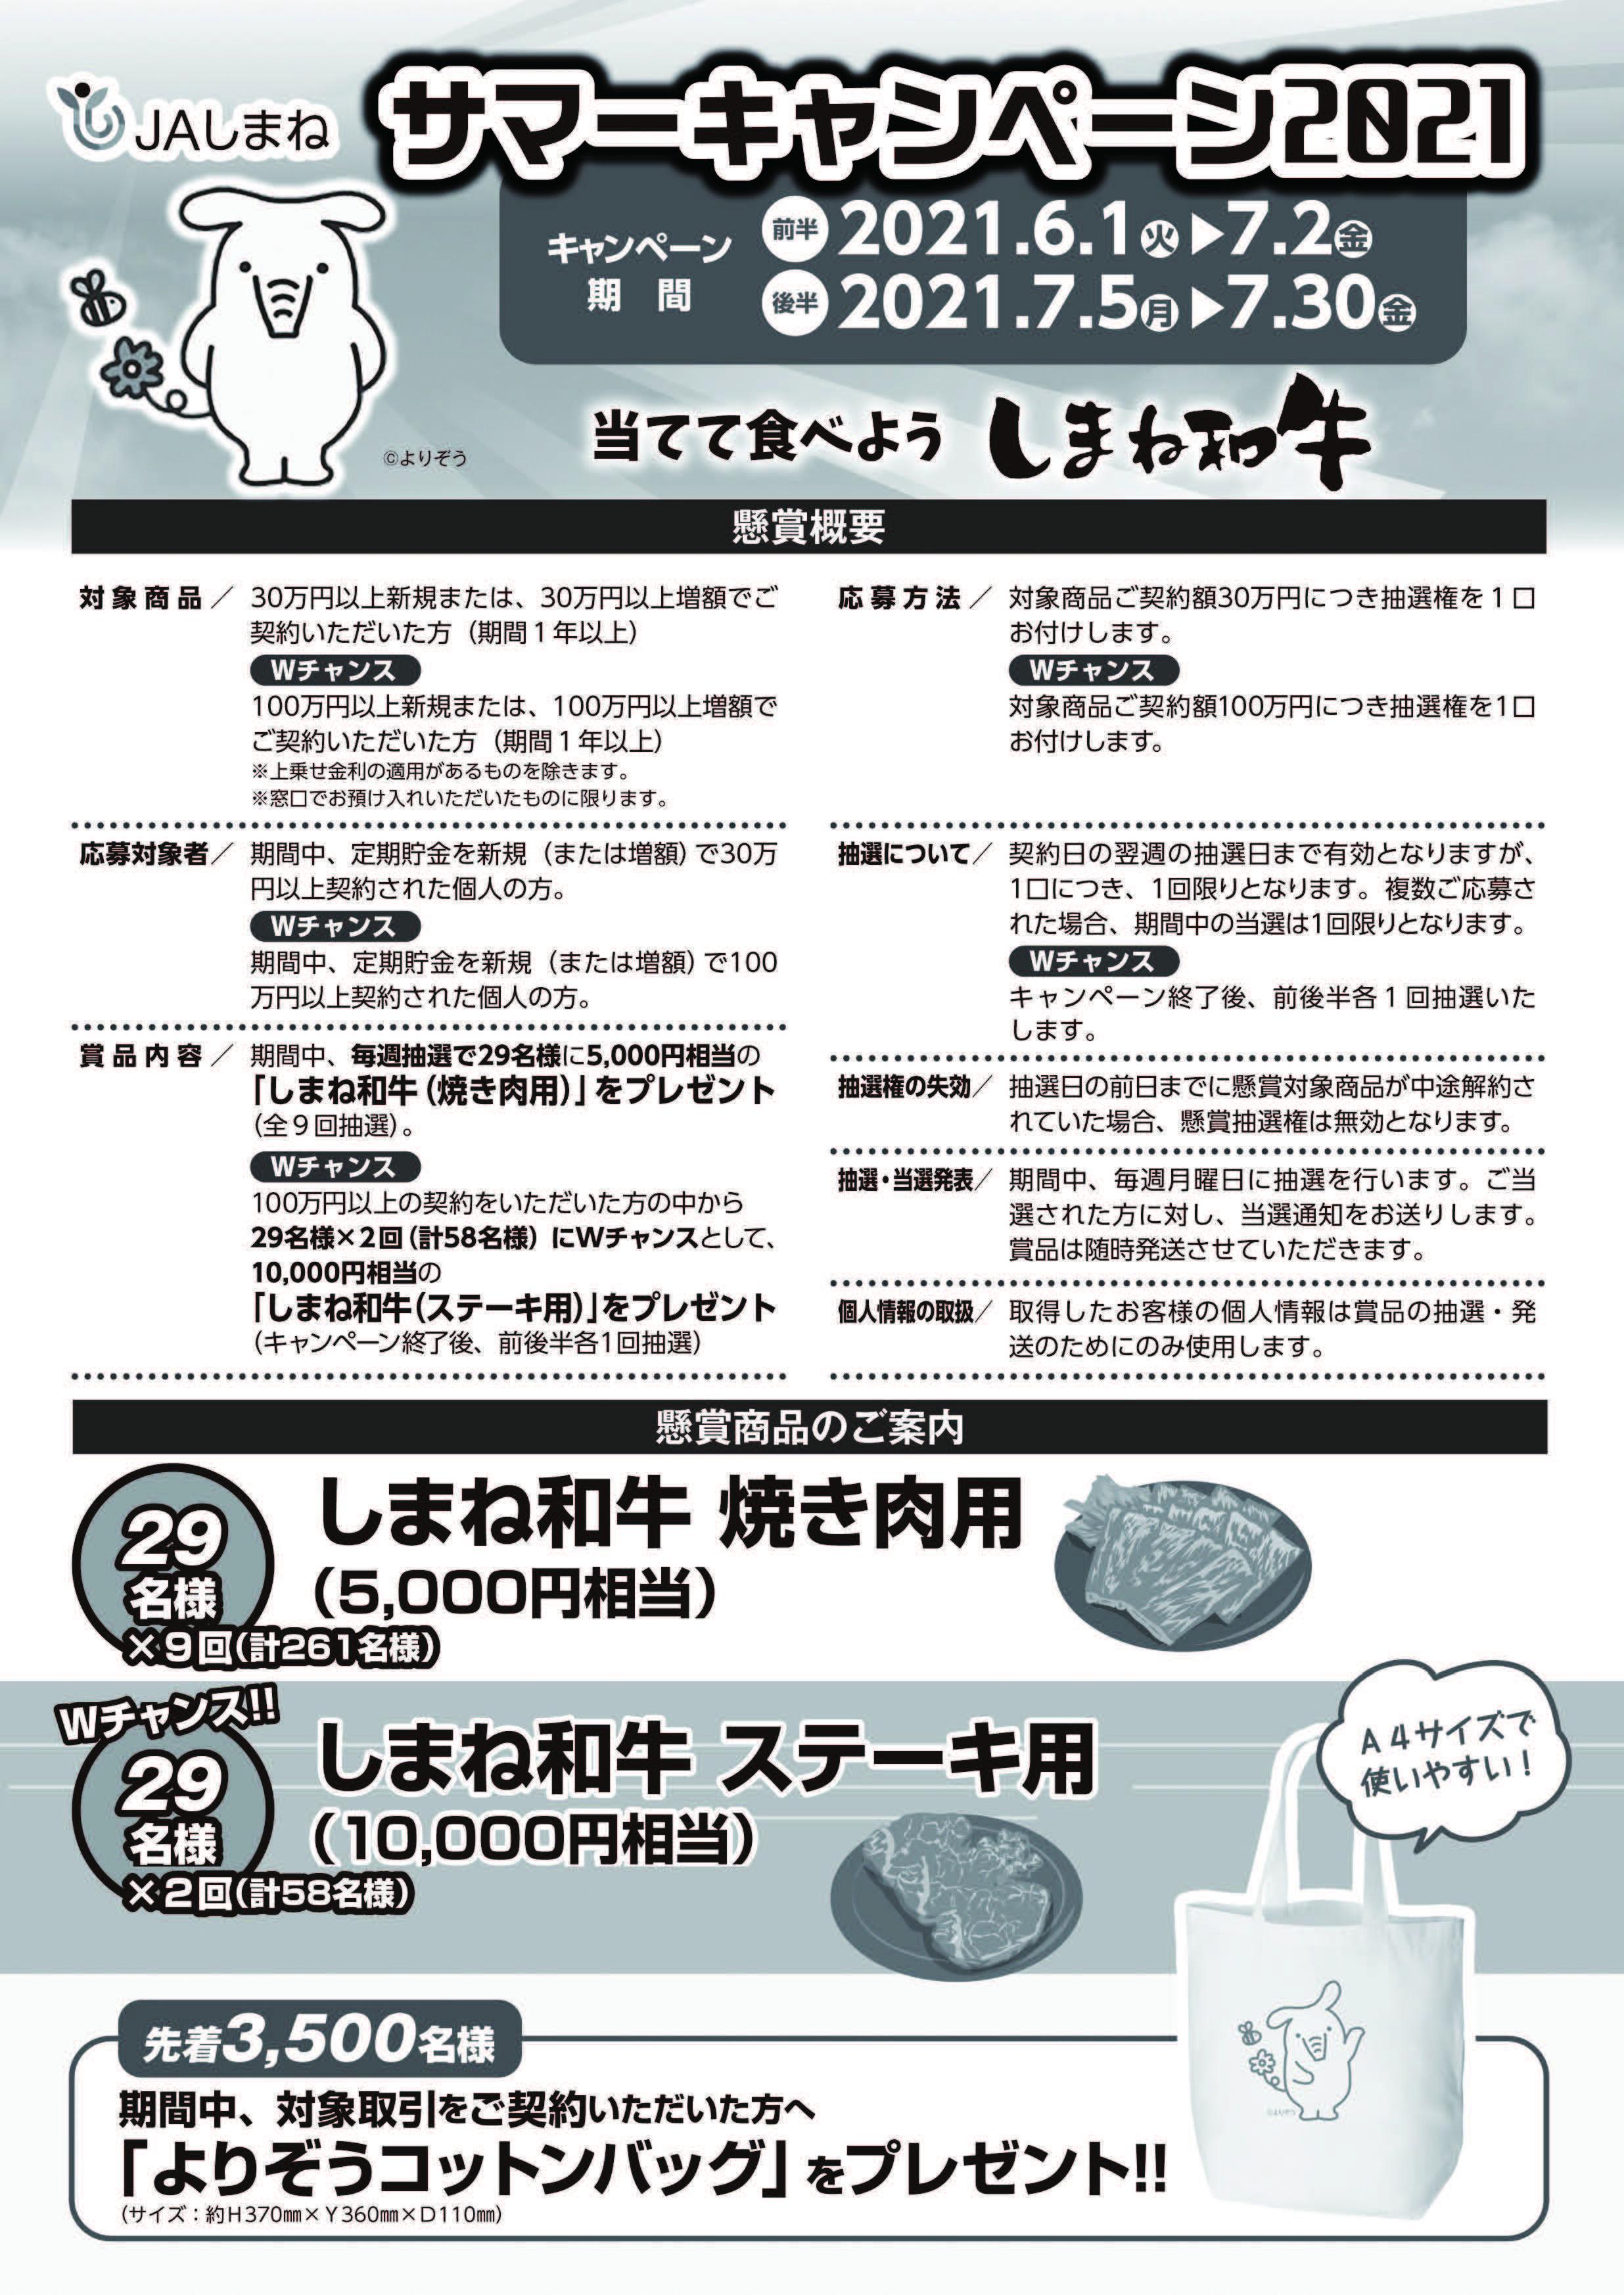 (R3.6.1~7.30)サマーキャンペーン2021チラシ(校了)_ページ_2.jpg